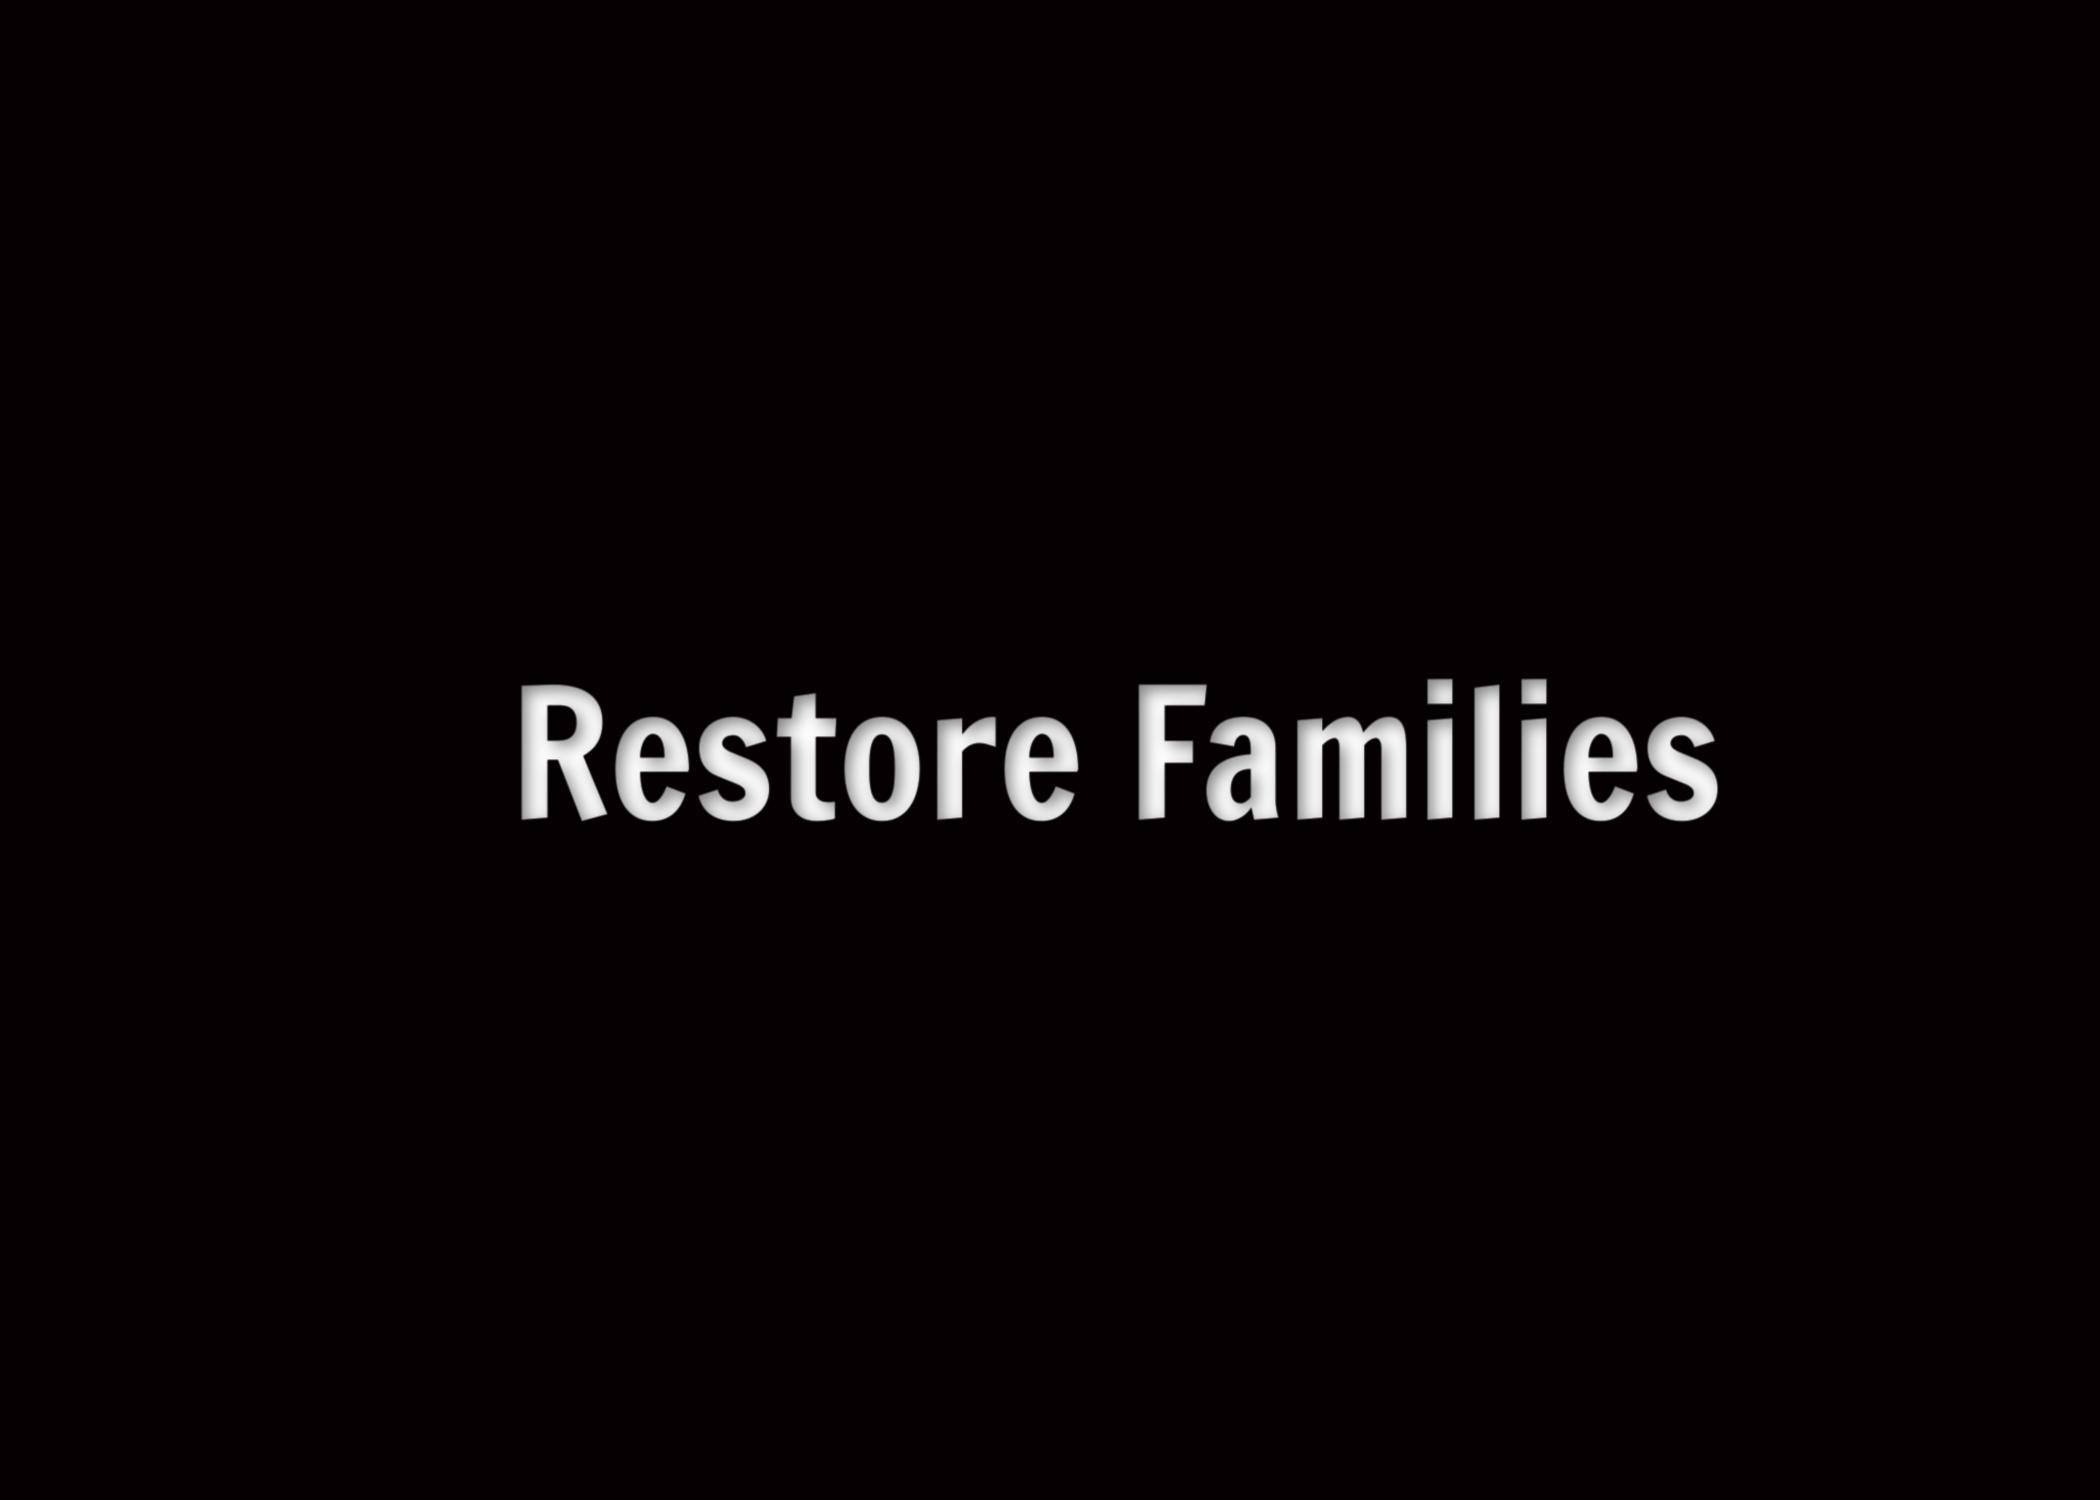 Restore Families